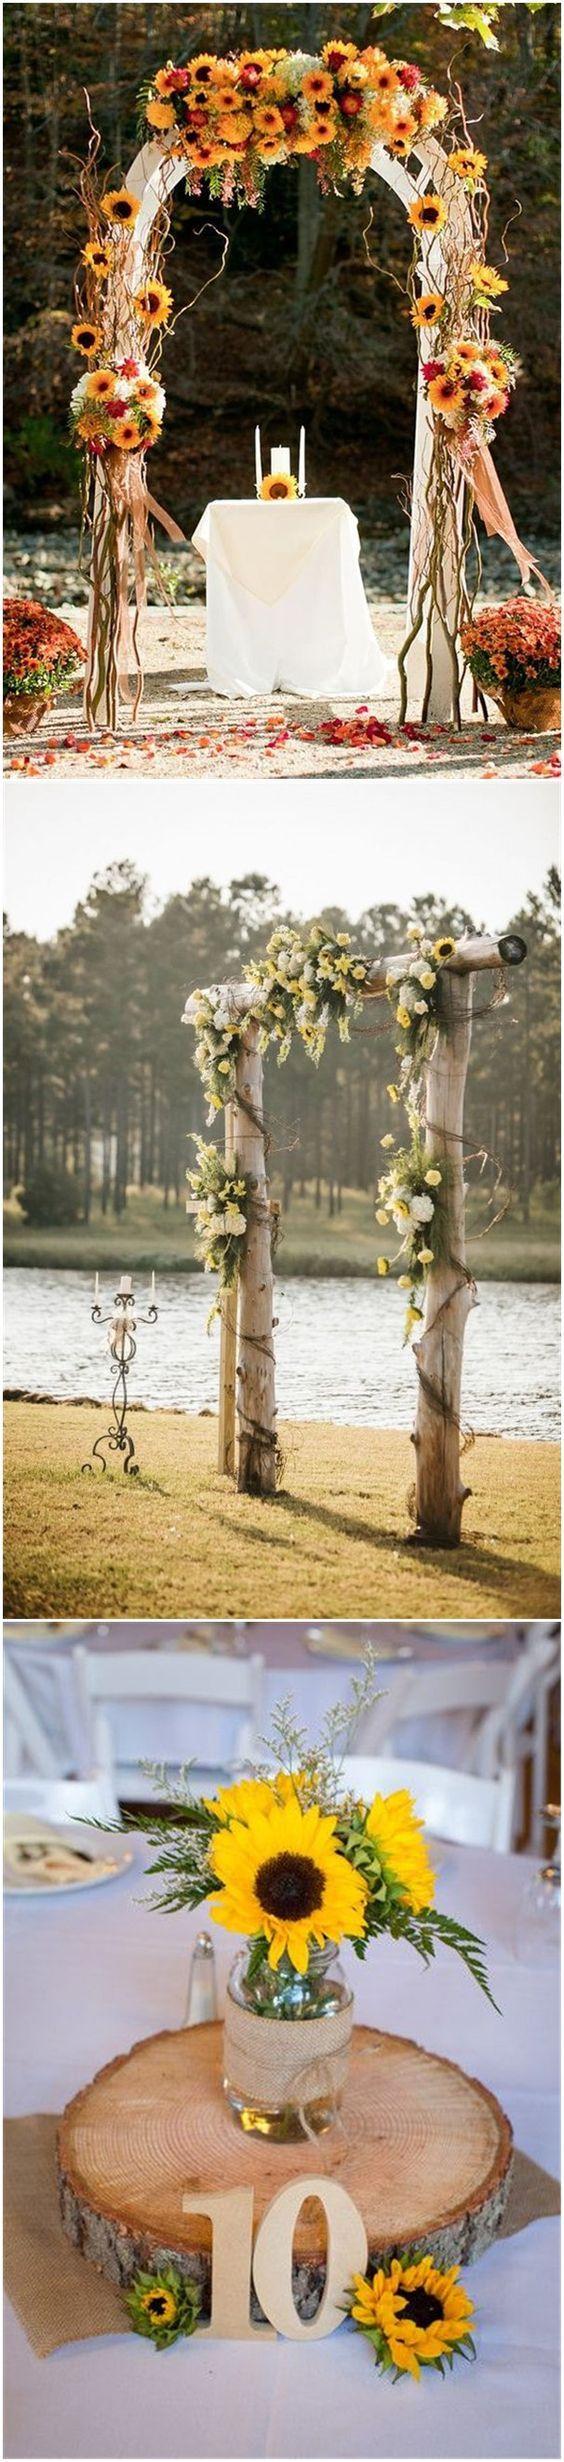 Yellow wedding decorations ideas november 2018  best wedding decorations images on Pinterest